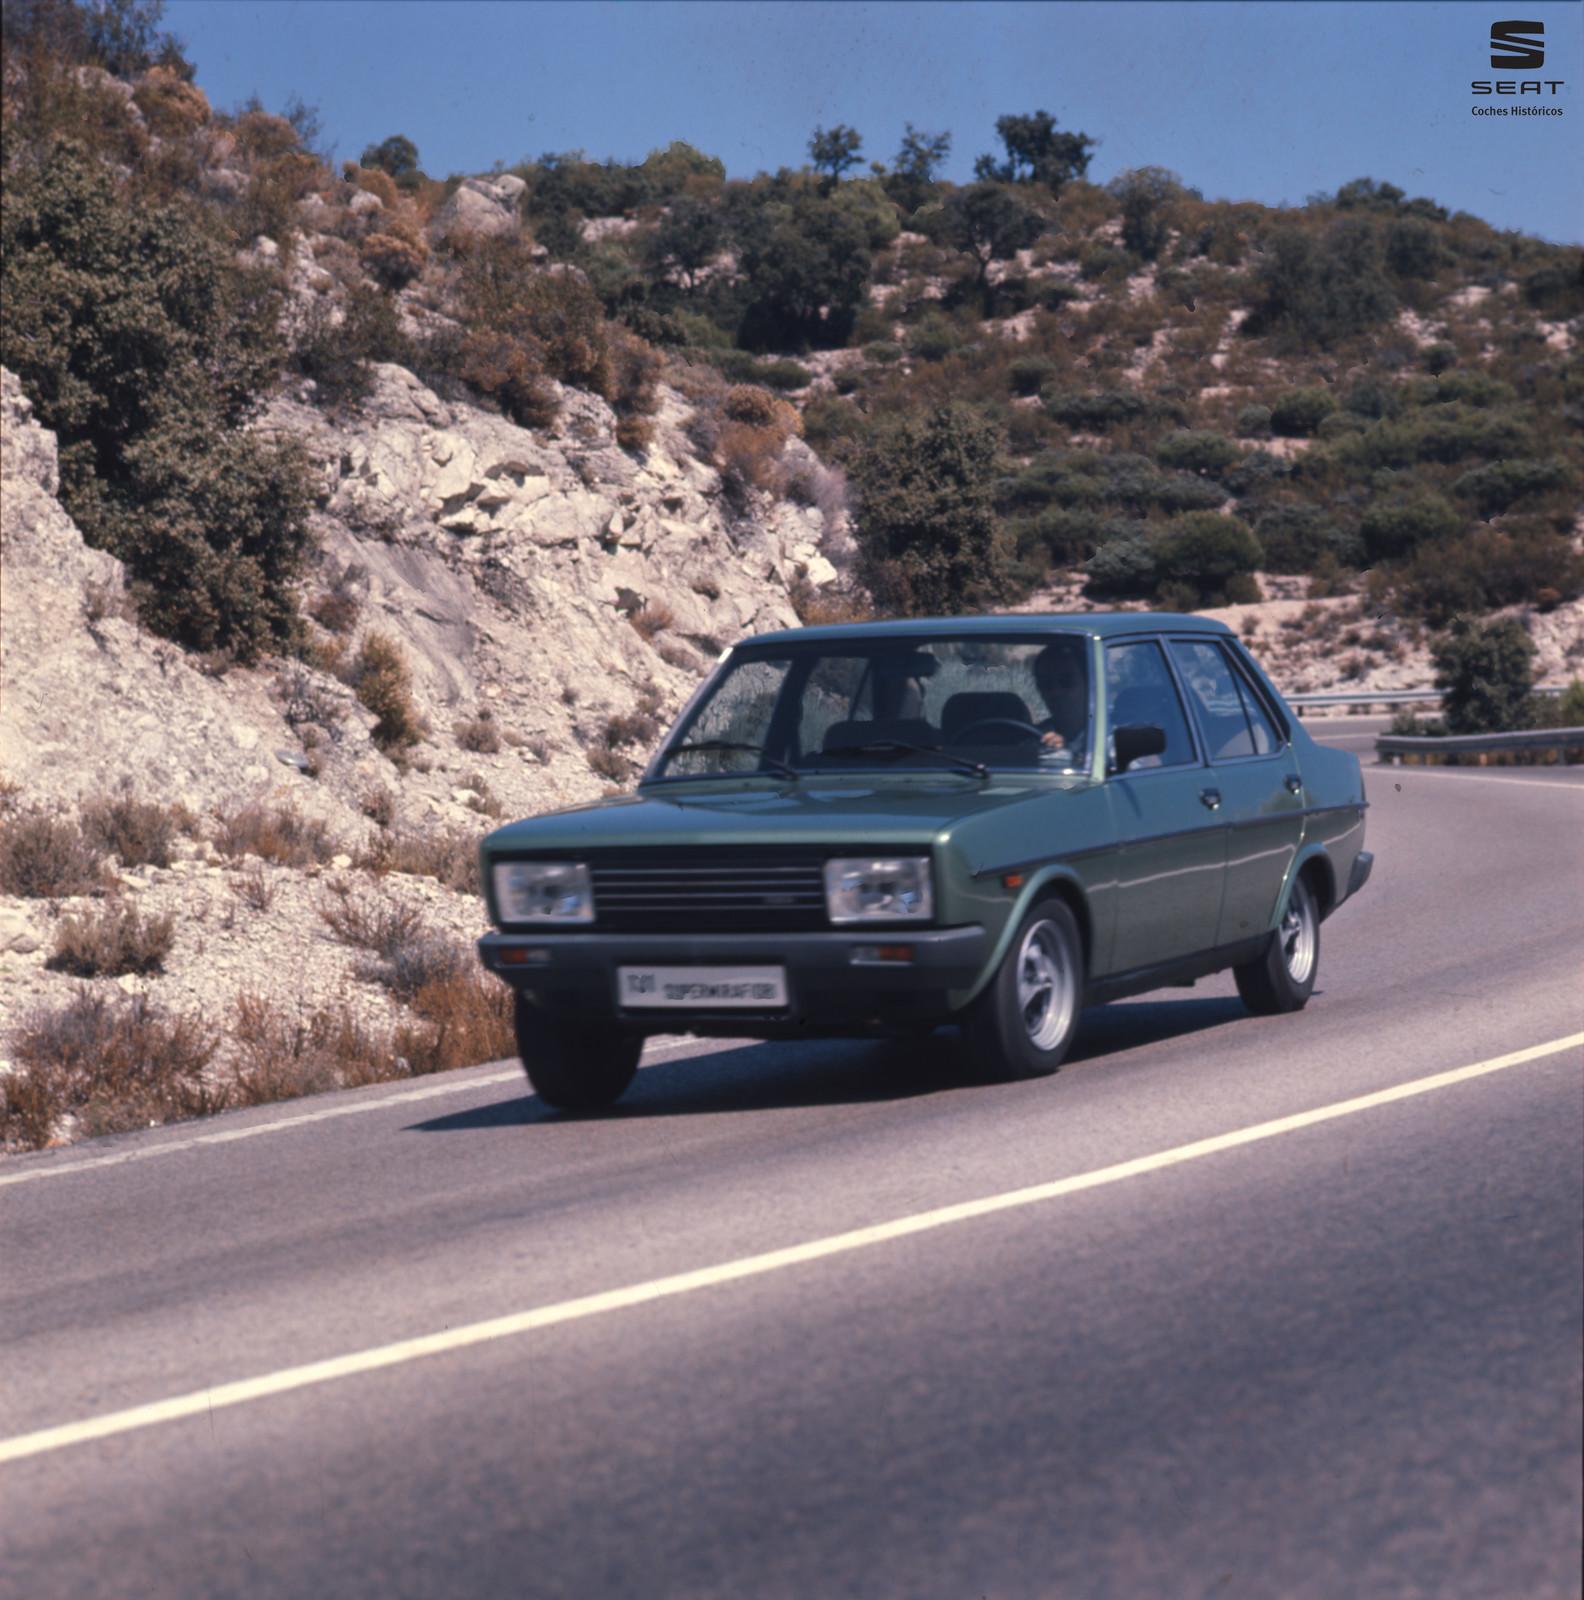 Foto de Motor SEAT 1430 - fotos históricas (27/49)